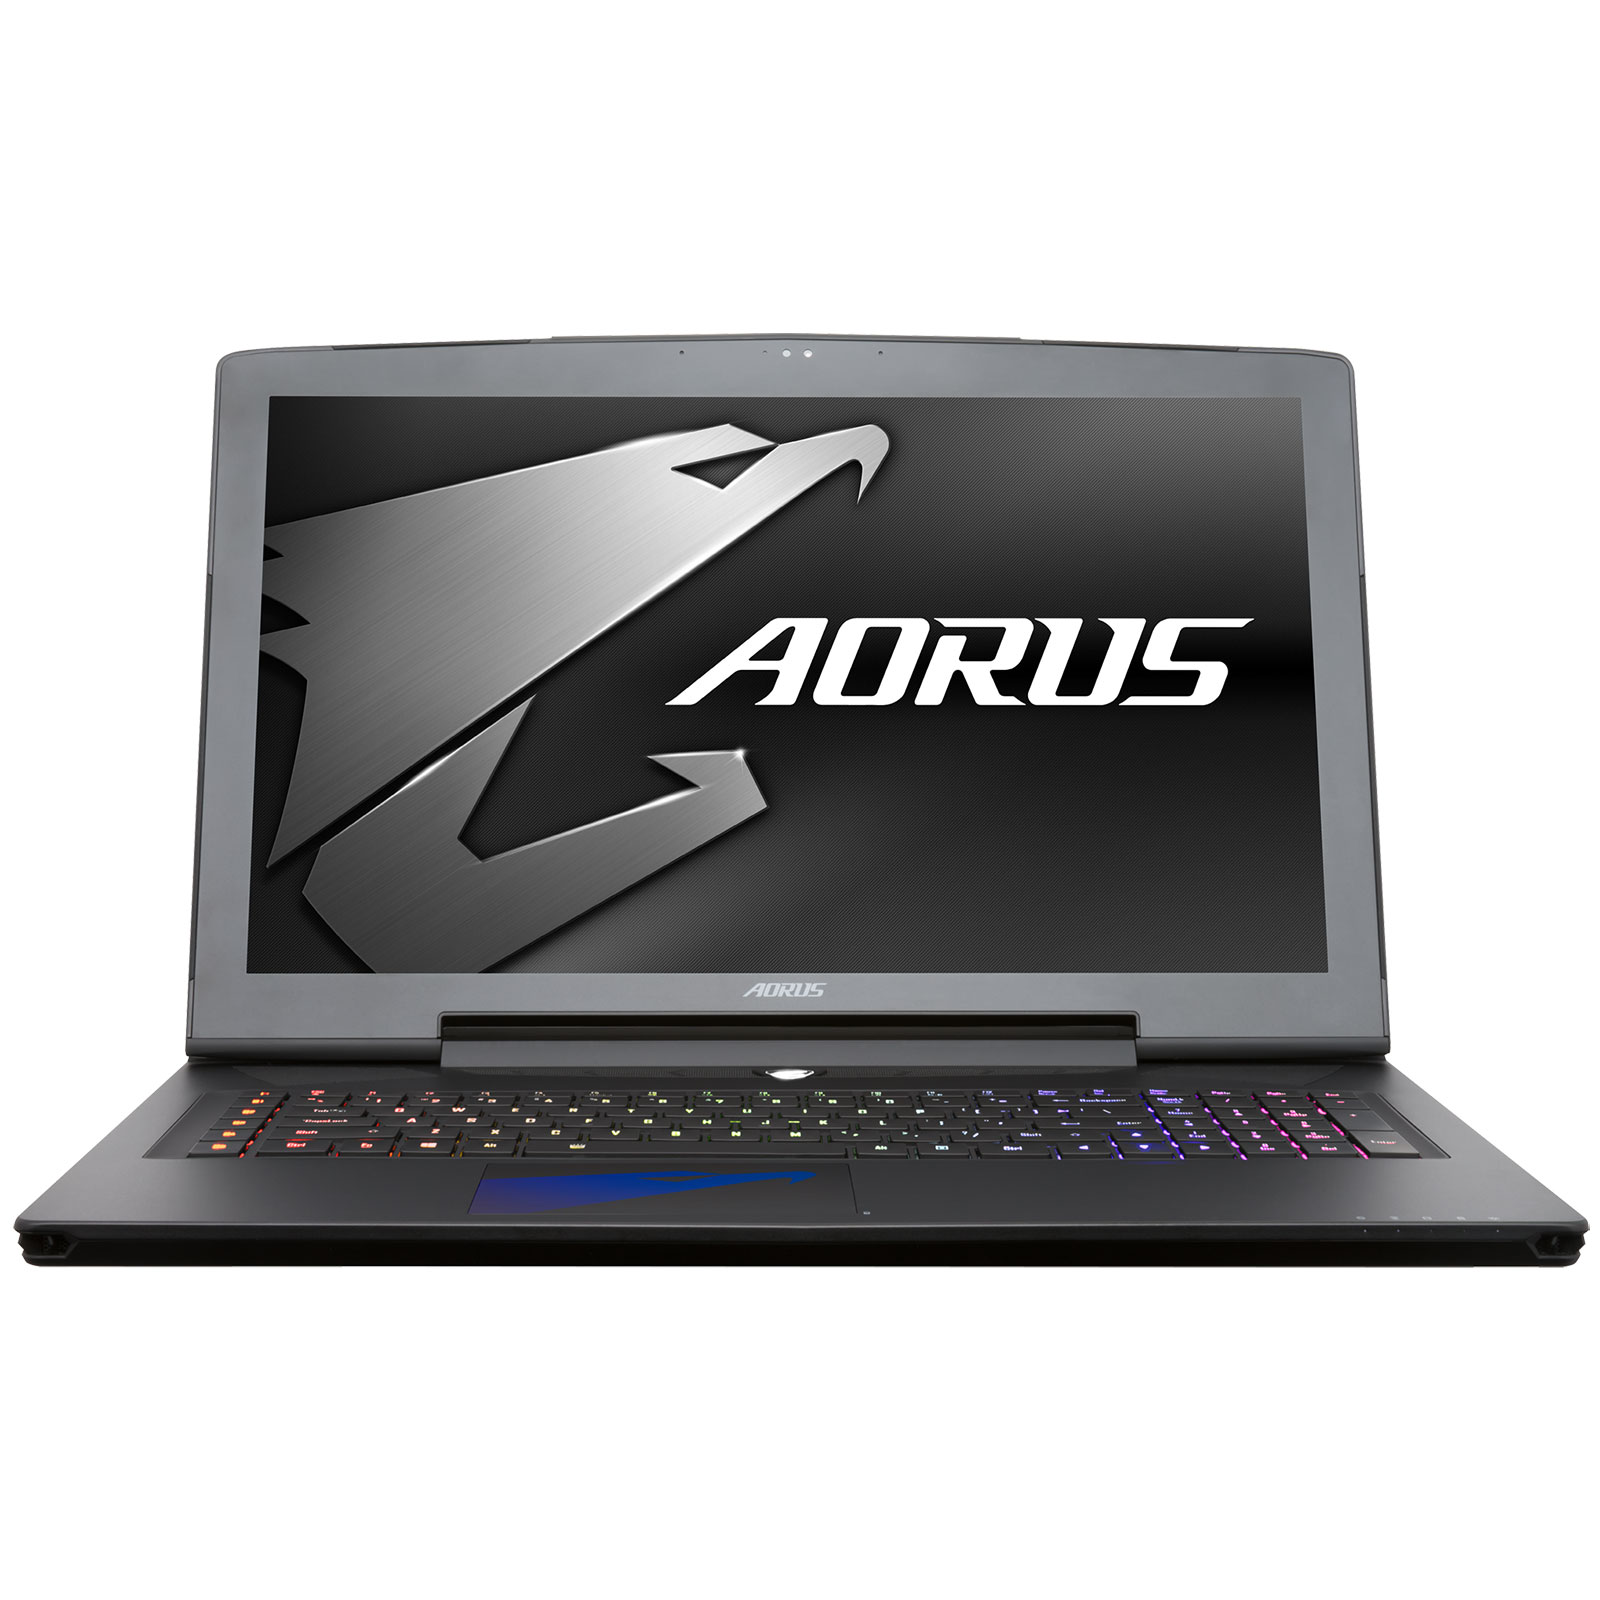 "PC portable AORUS X7 v6 K1NW10-FR Intel Core i7-6820HK 16 Go SSD 256 Go + HDD 1 To 17.3"" LED Full HD G-SYNC NVIDIA GeForce GTX 1070 Wi-Fi AC/Bluetooth Webcam Windows 10 Famille 64 bits"